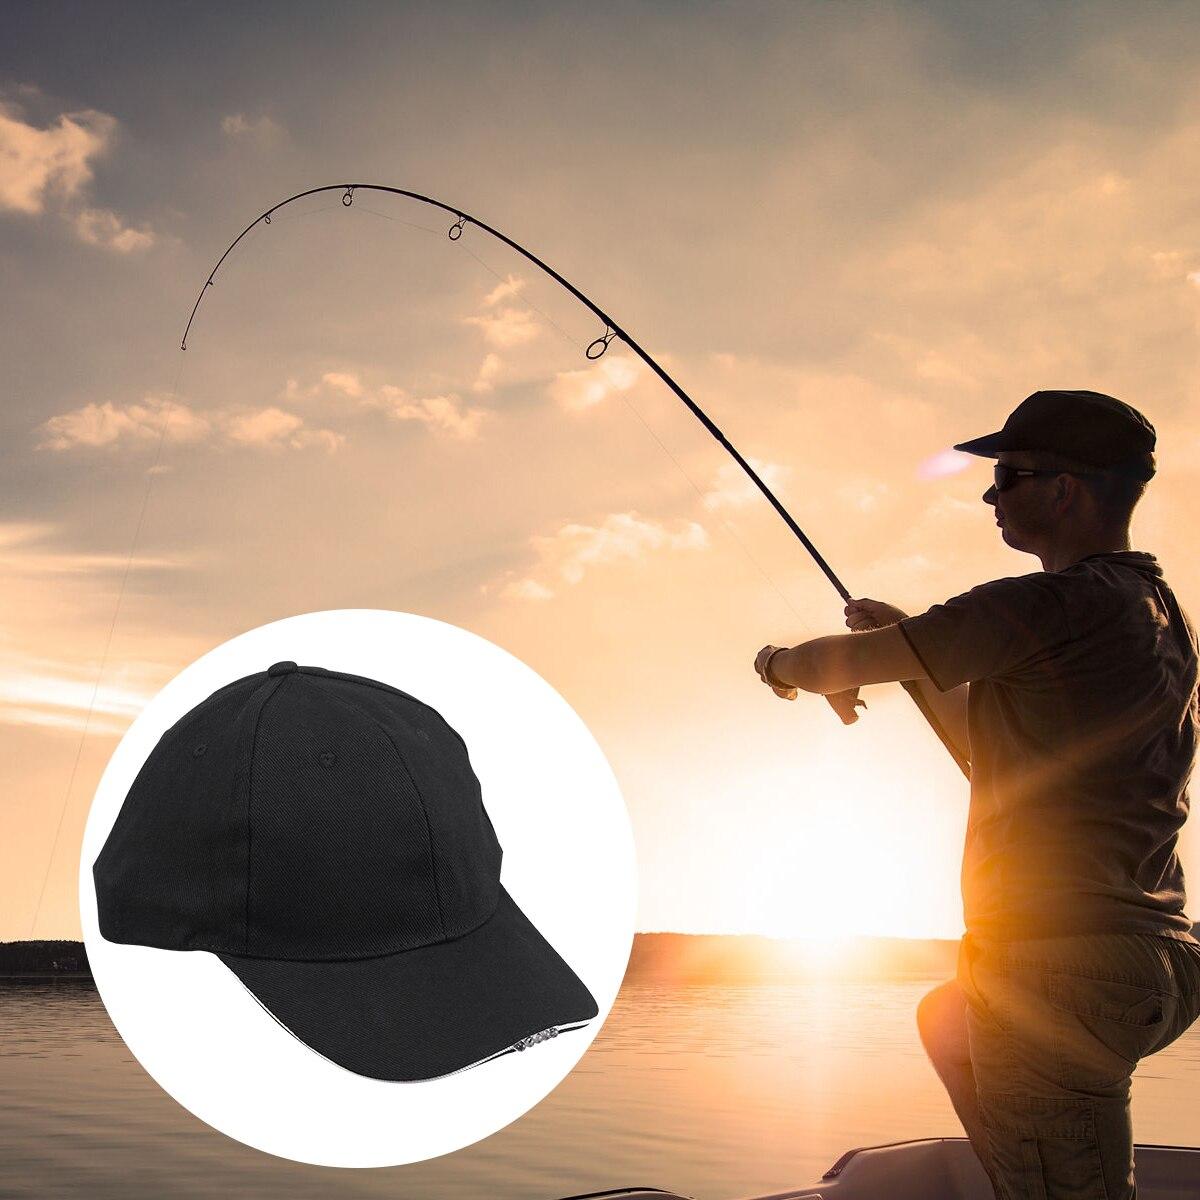 Generous 1pc Baseball Cap Quality Warm Unisex Led Flash Light Led Cap Hat Adjustable Cap Hiking Hunting Camping Fishing Numerous In Variety